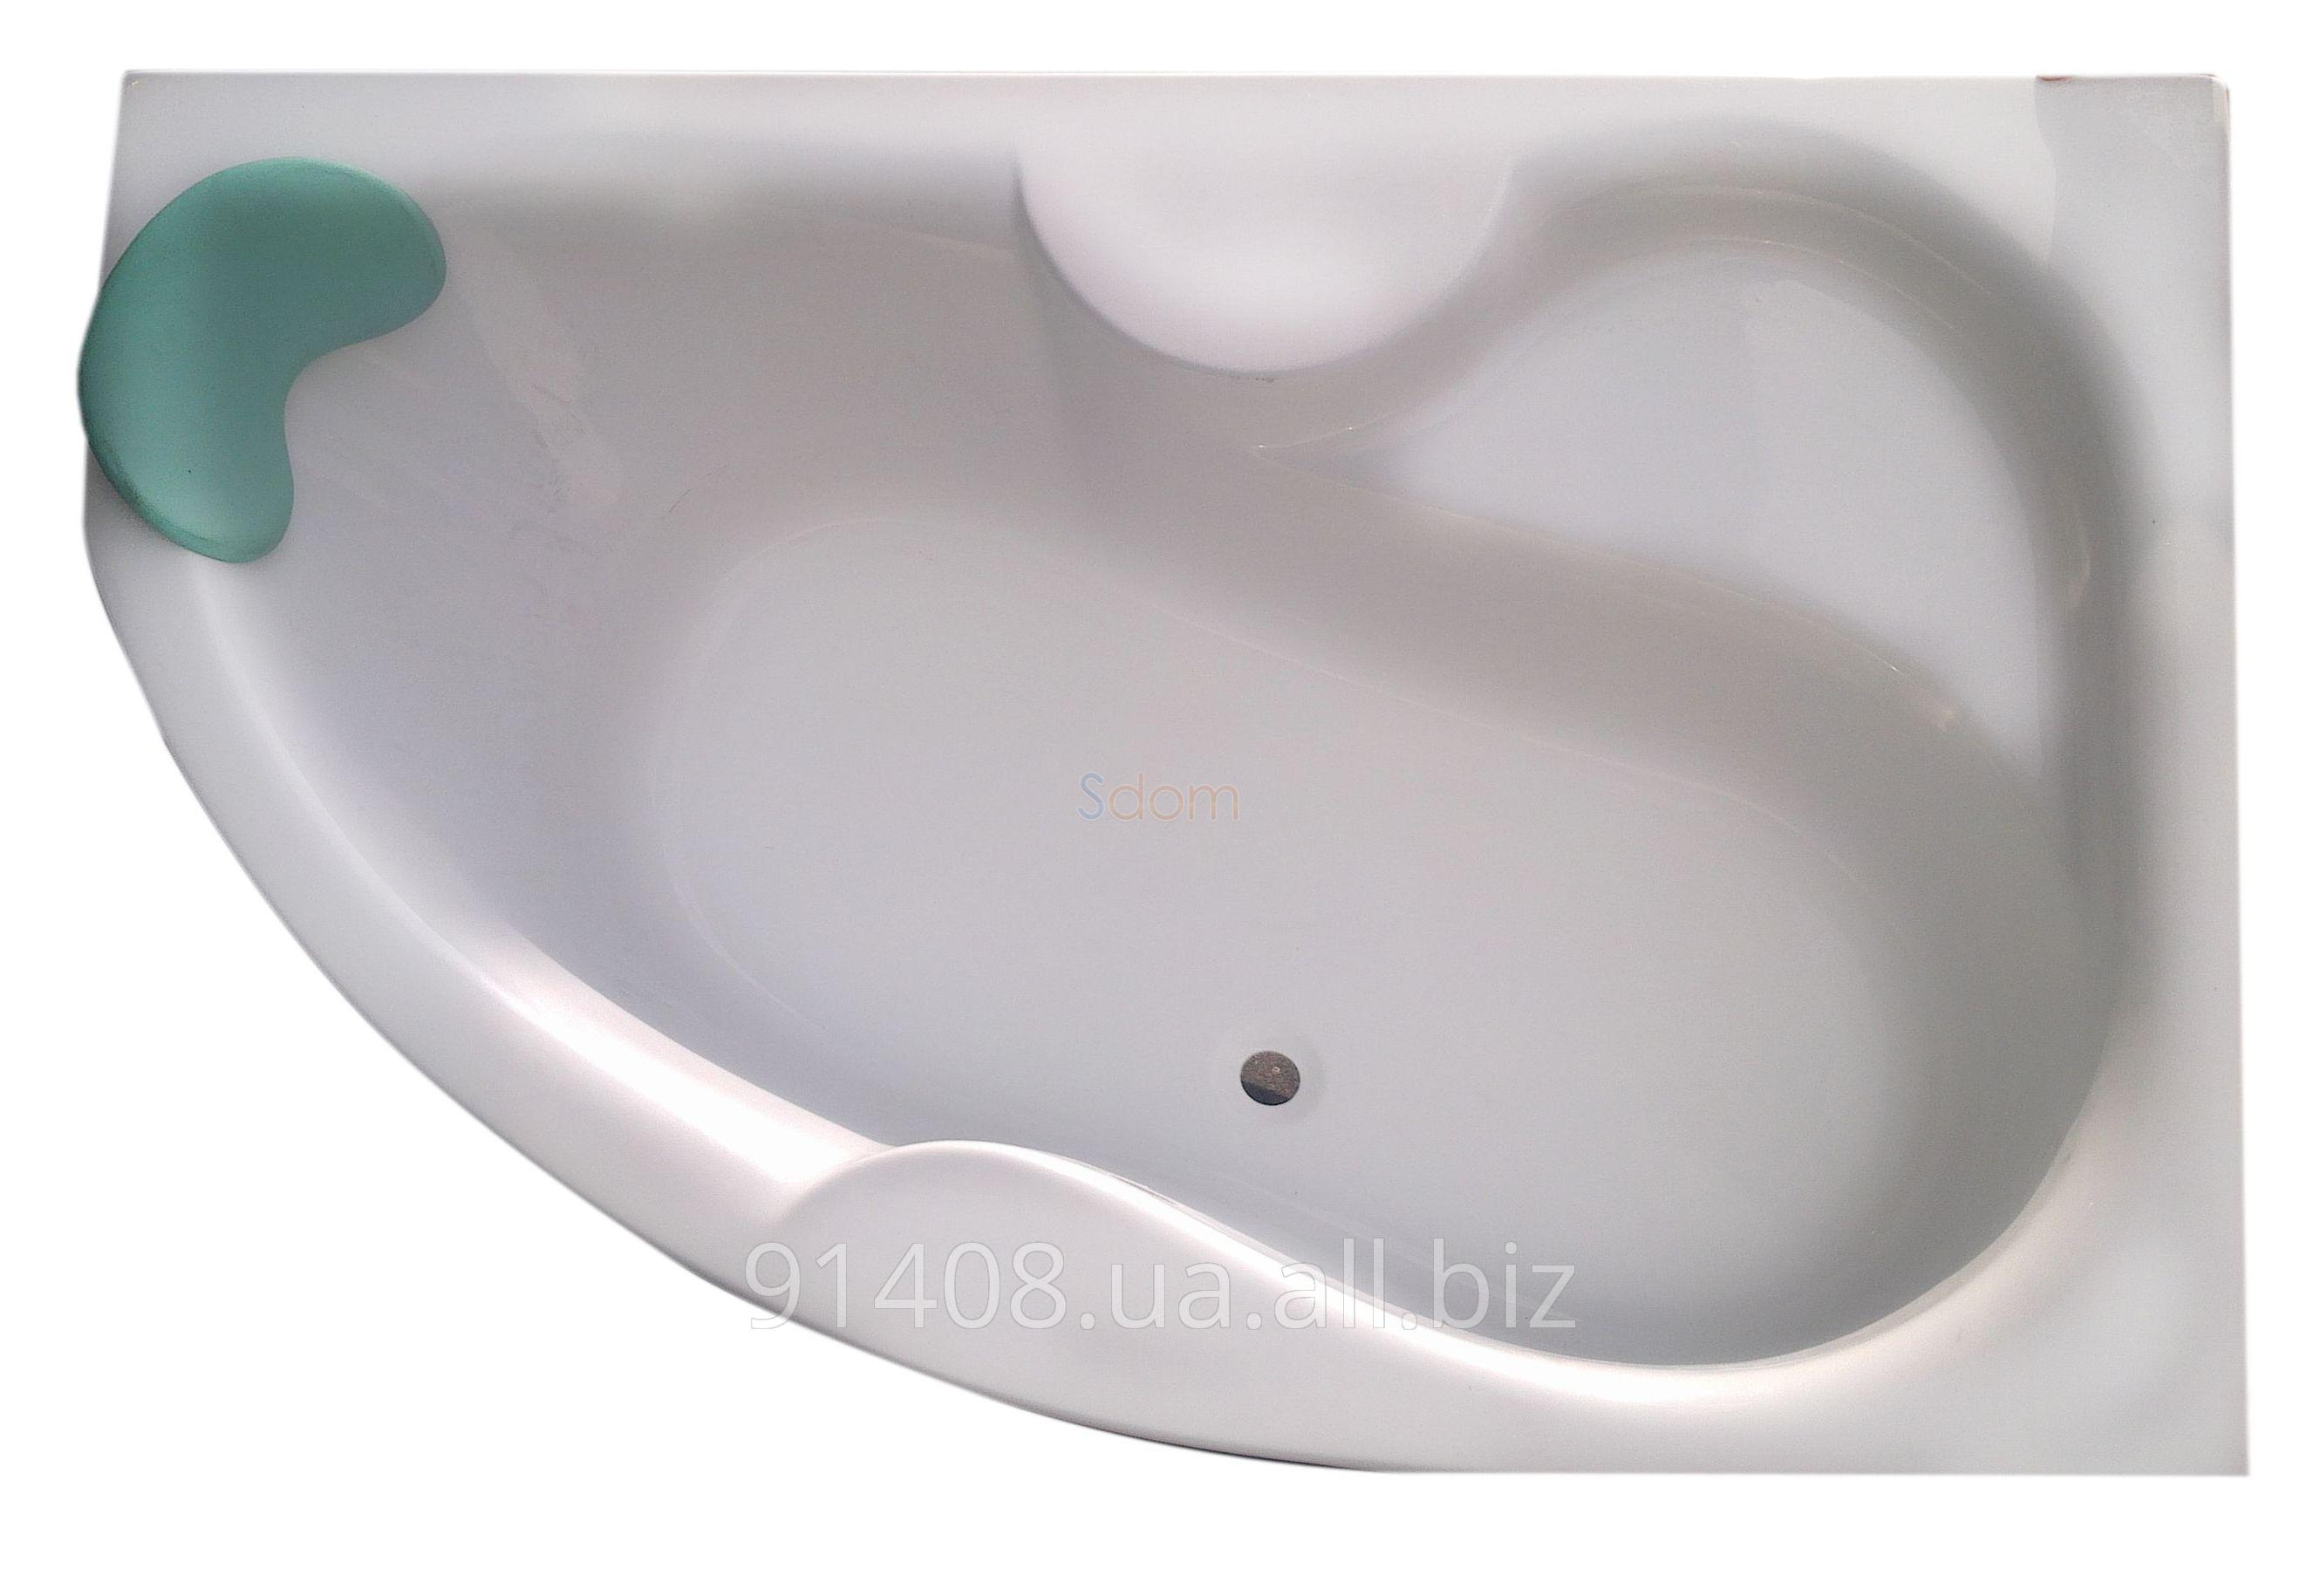 vanna_gidromassazhnaya_koller_pool_montana_150_hydro_optimal